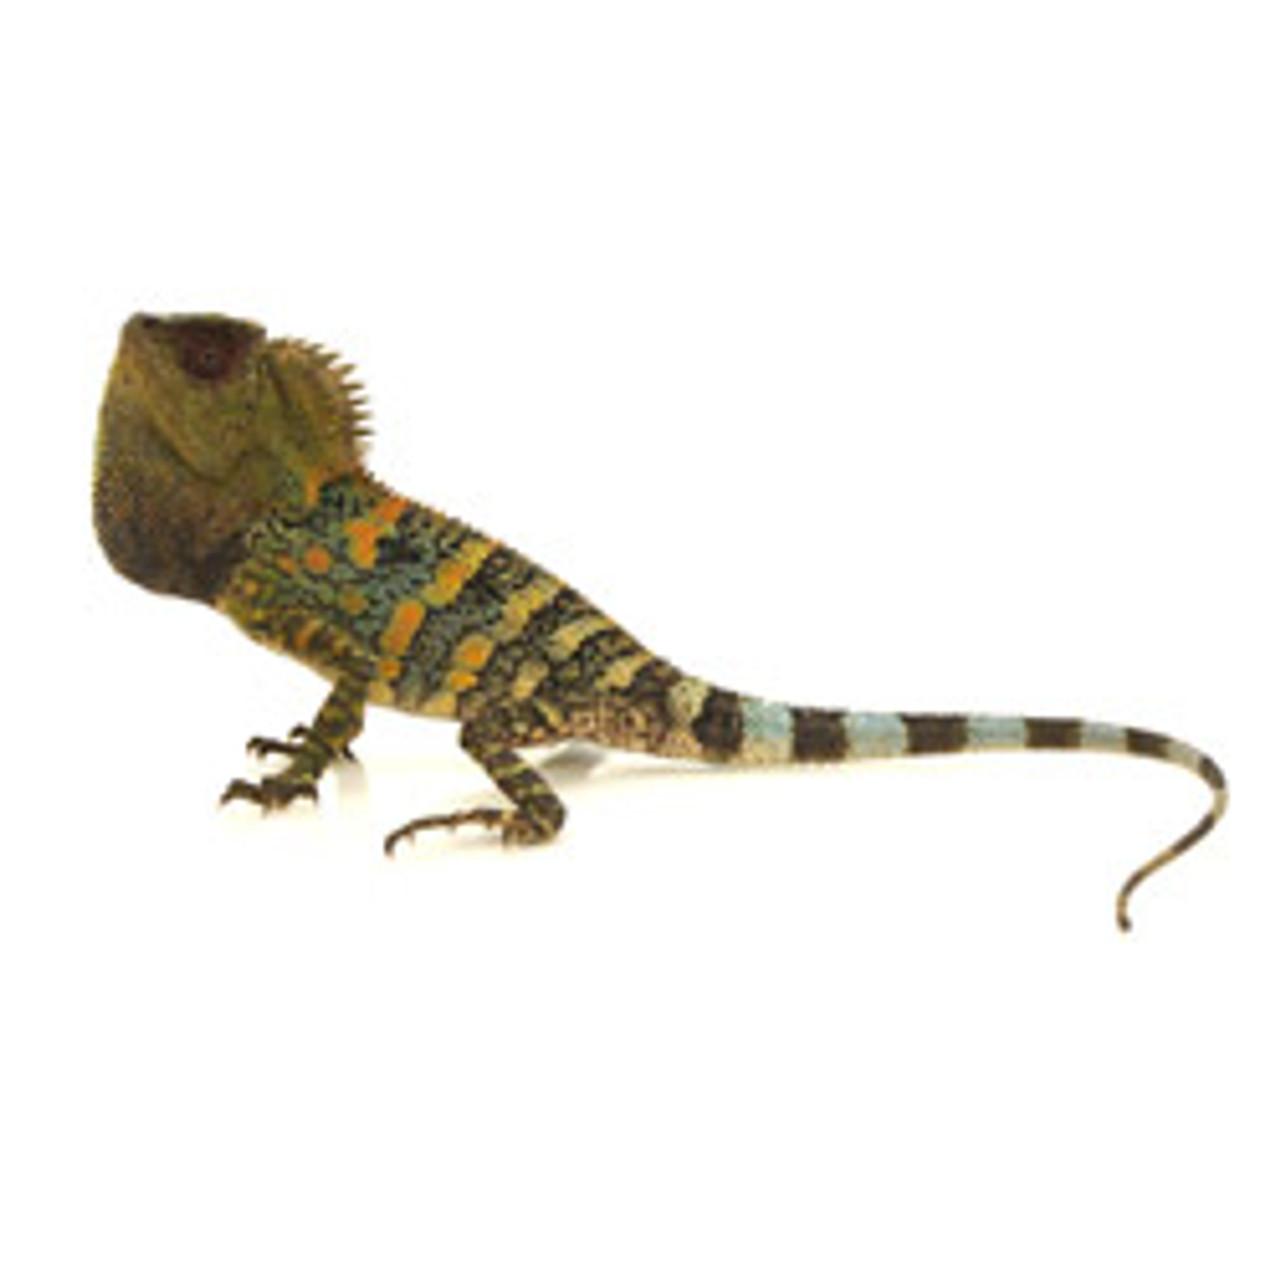 Crested River Dragon (Gonocephalus chameleonitus)